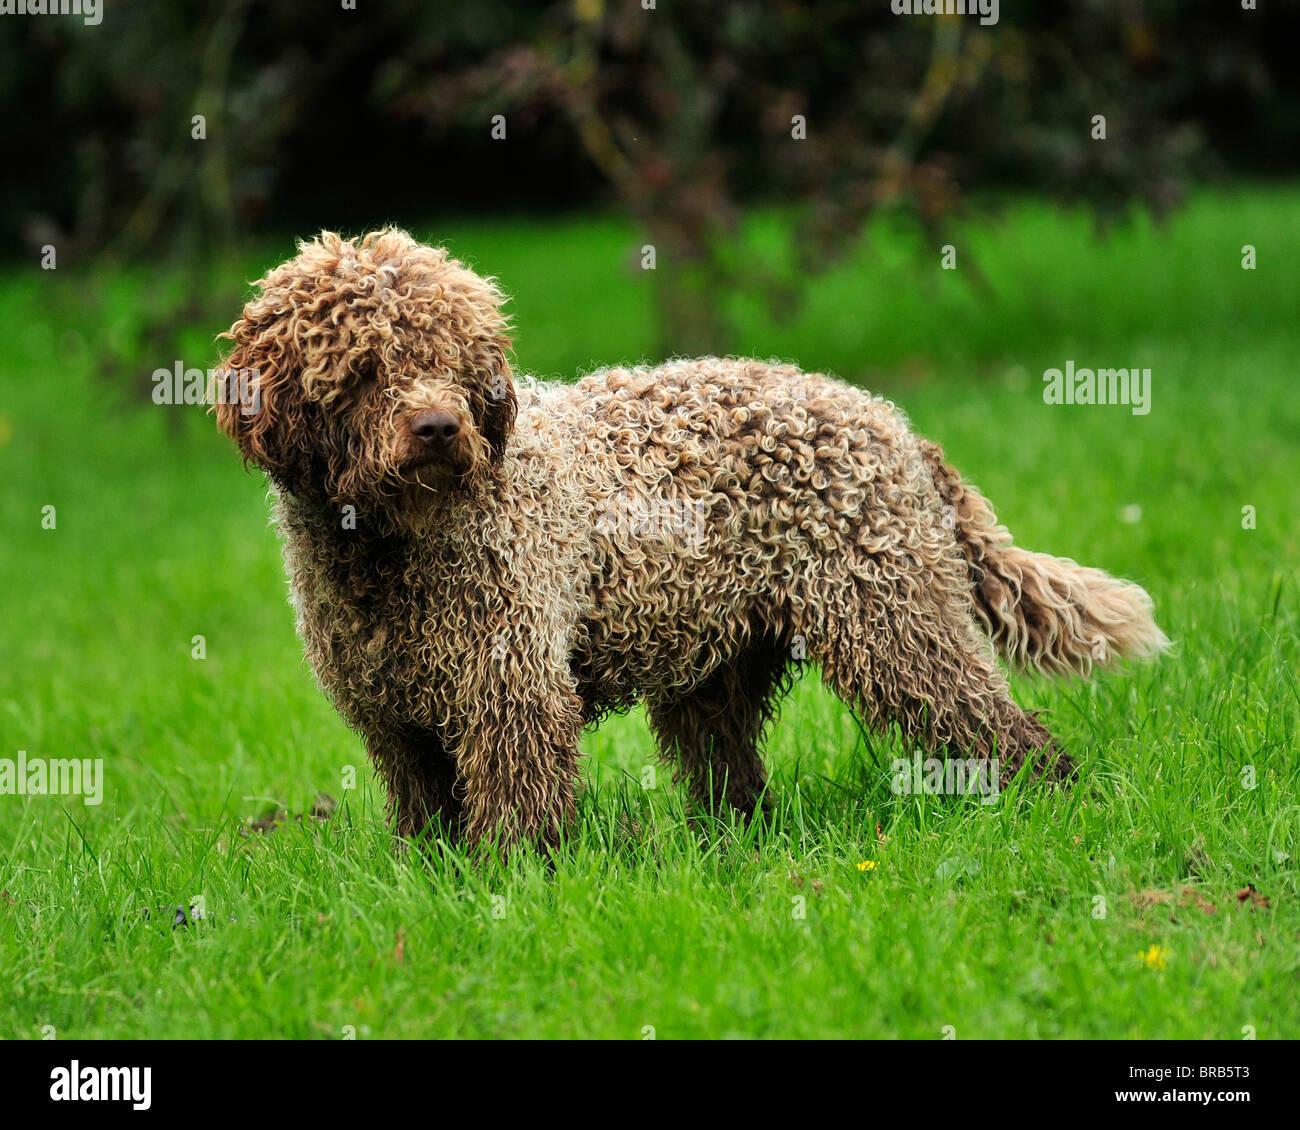 Lagotto Truffle Dogs: Lagotto Romagnolo, Italian Gundog Stock Photo: 31593523